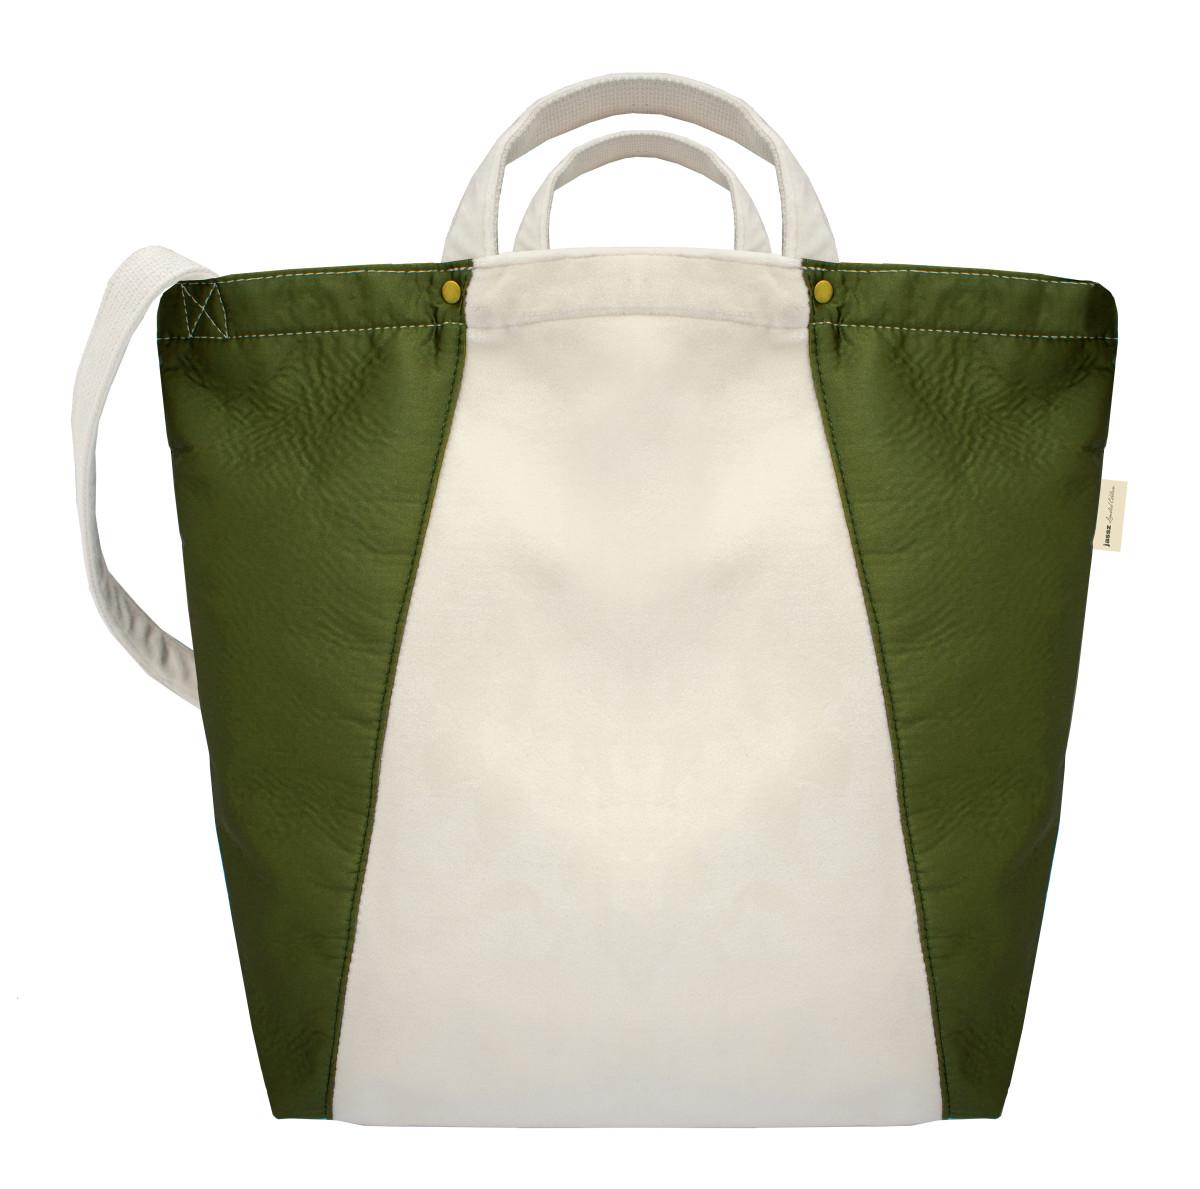 Jassz Bags Kiyomi Satin Velvet Tote Bag